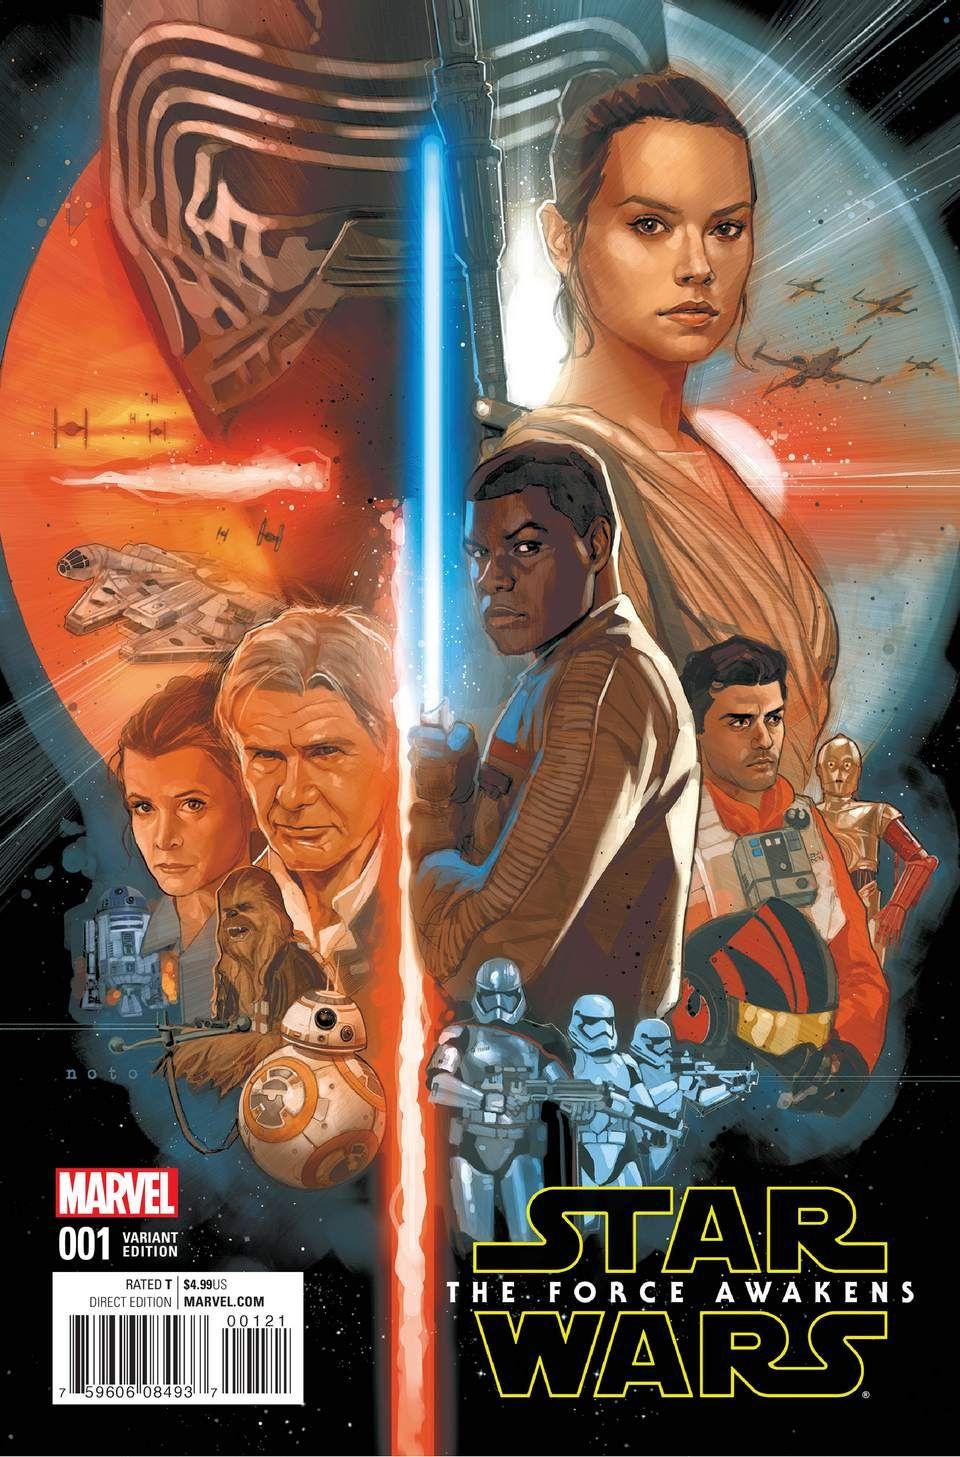 Read Star Wars The Force Awakens Issue 01 Online Read Star Wars